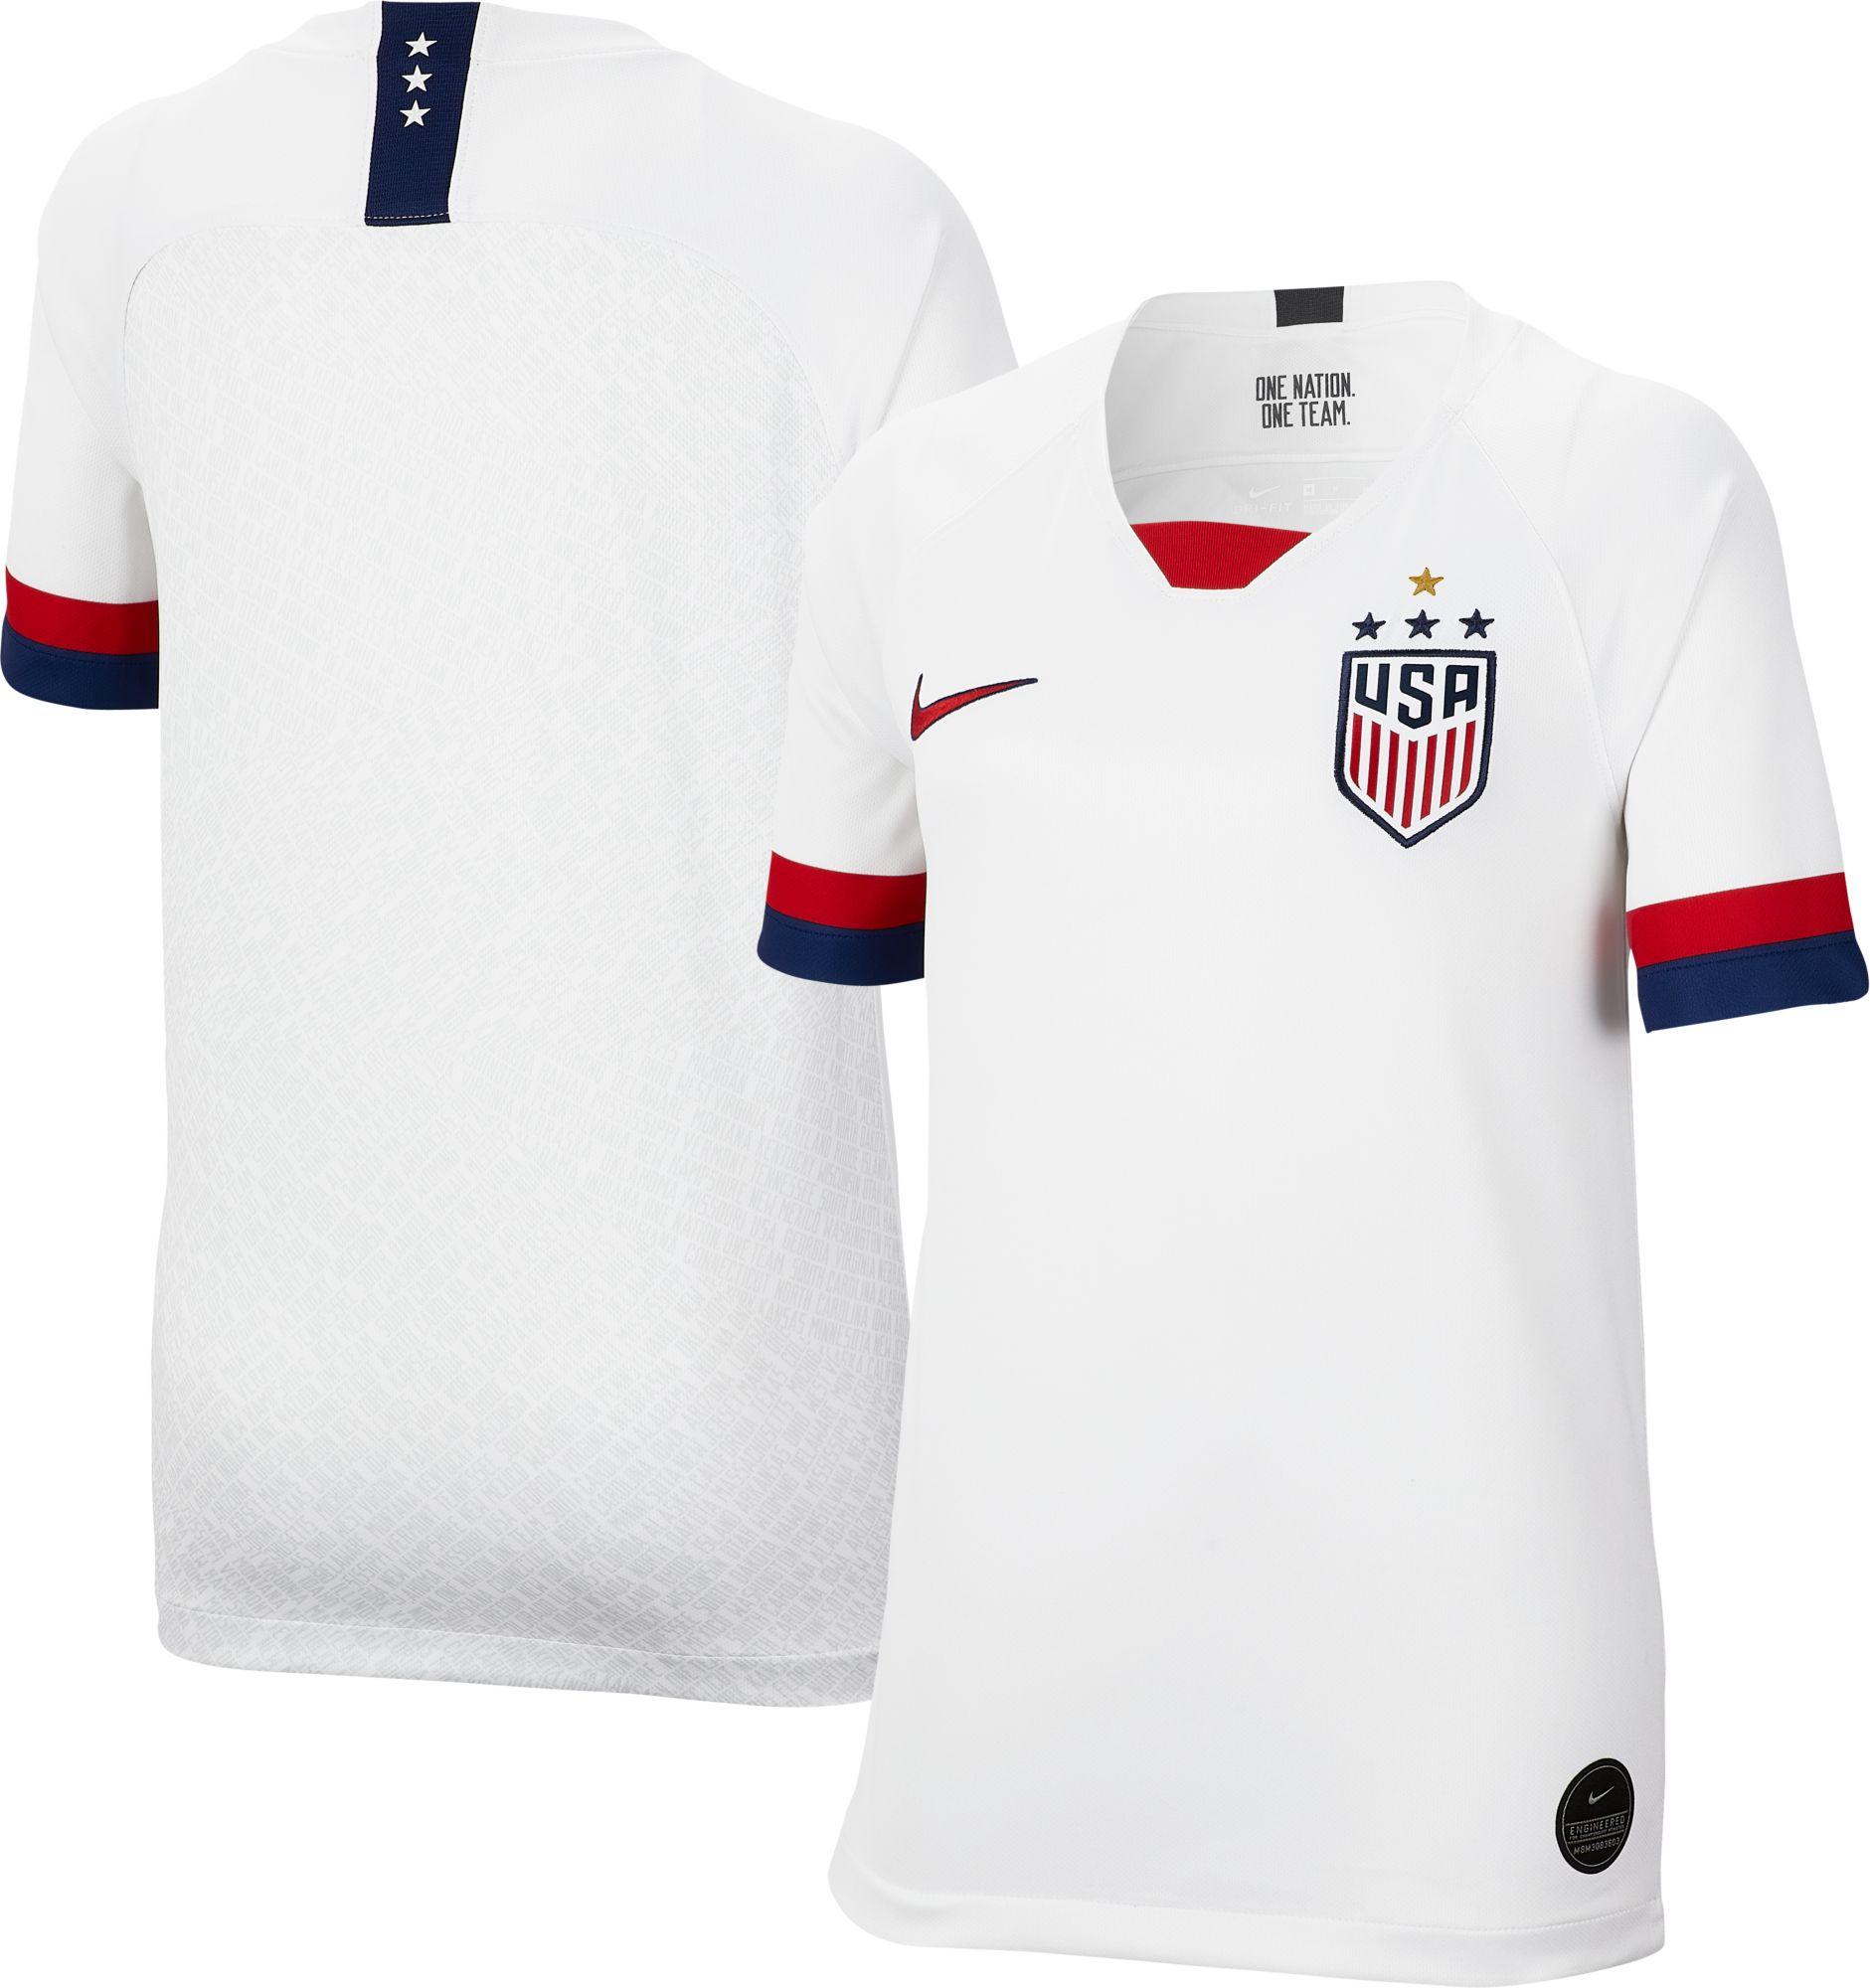 usa world cup jersey